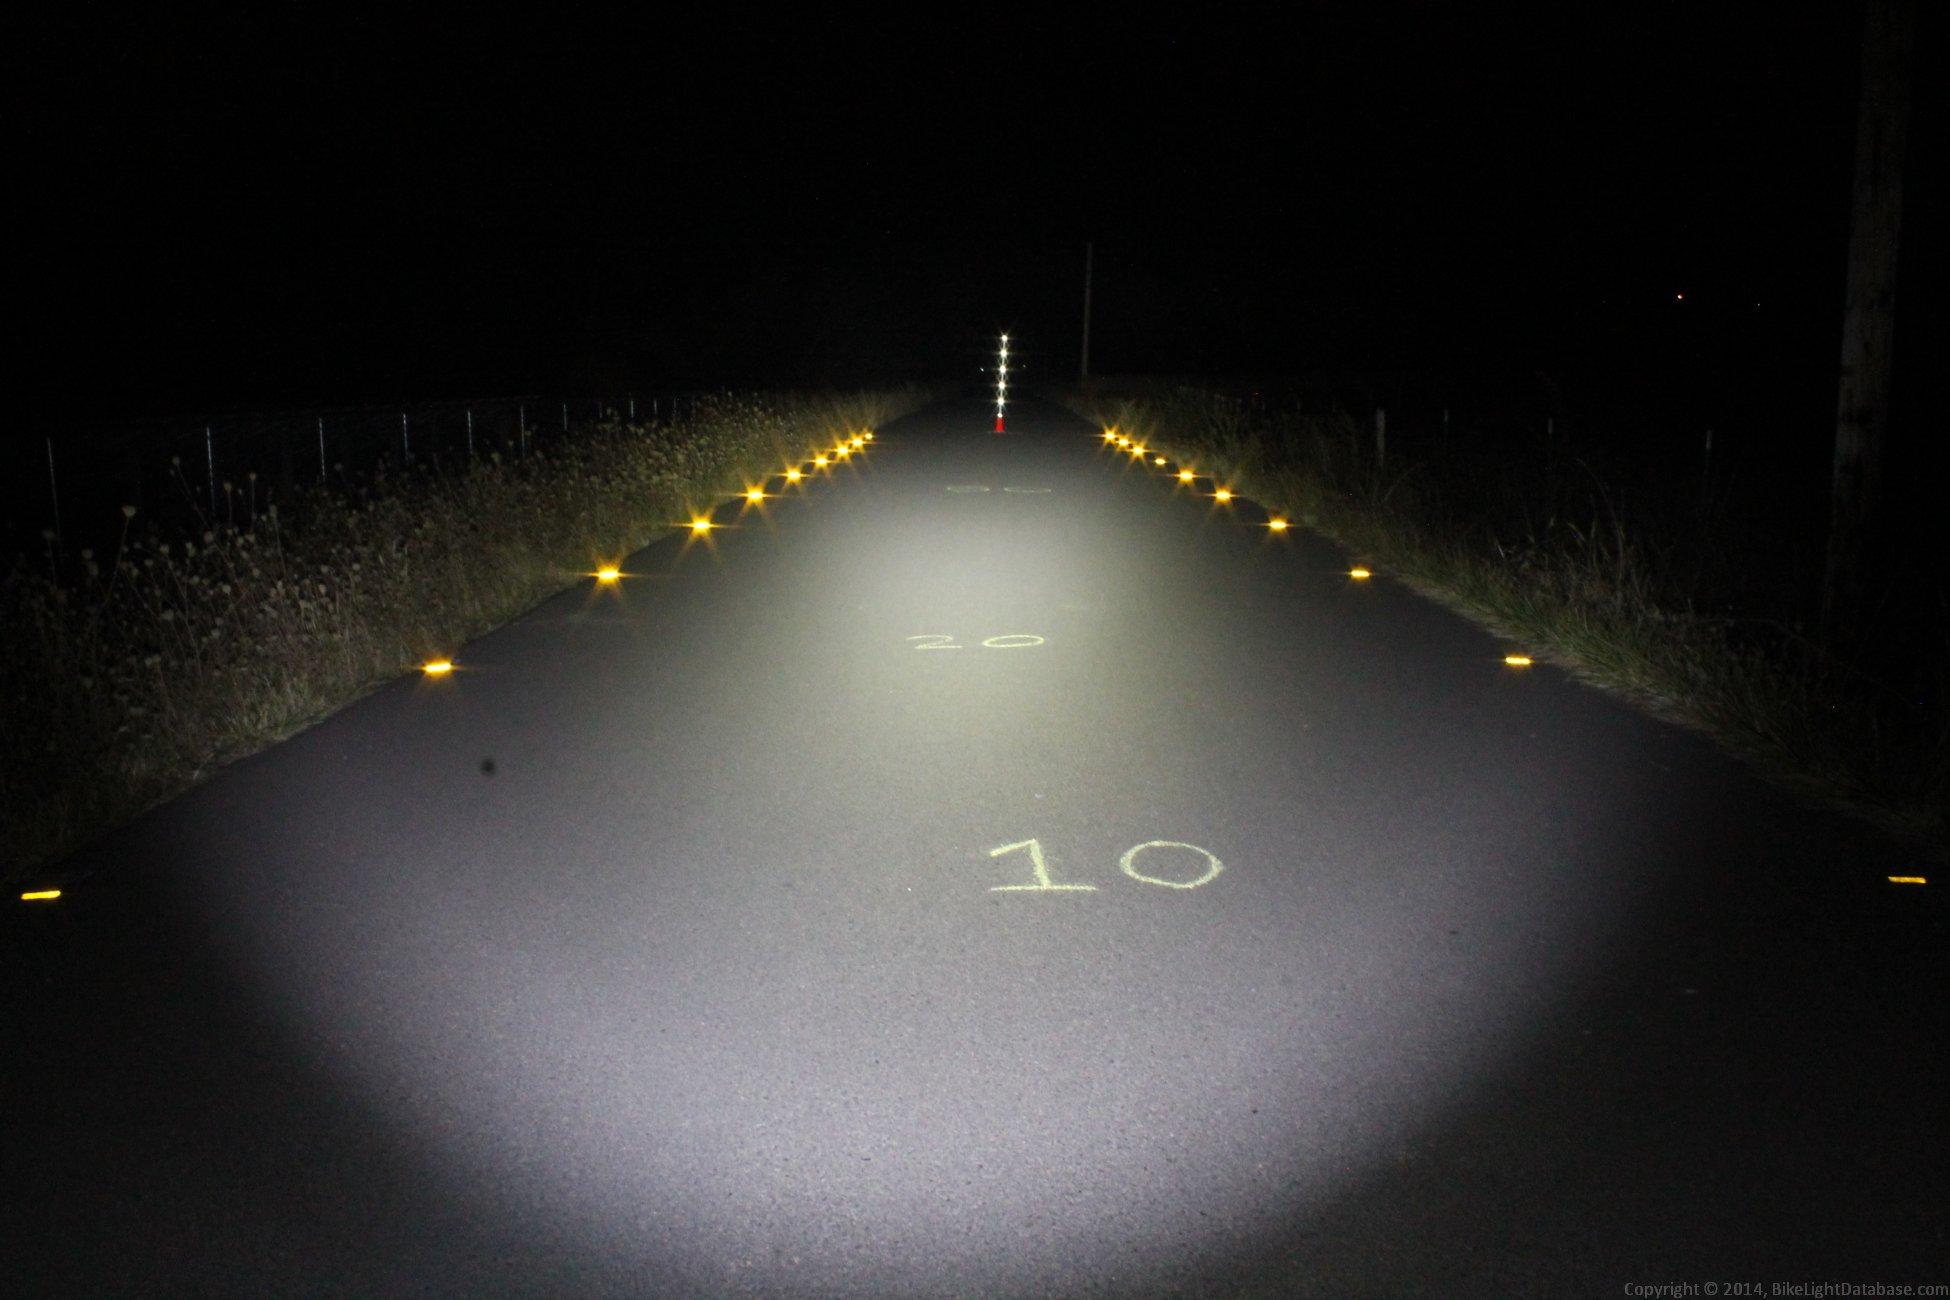 Generic Cree U2 Generic Light Review The Bike Light Database